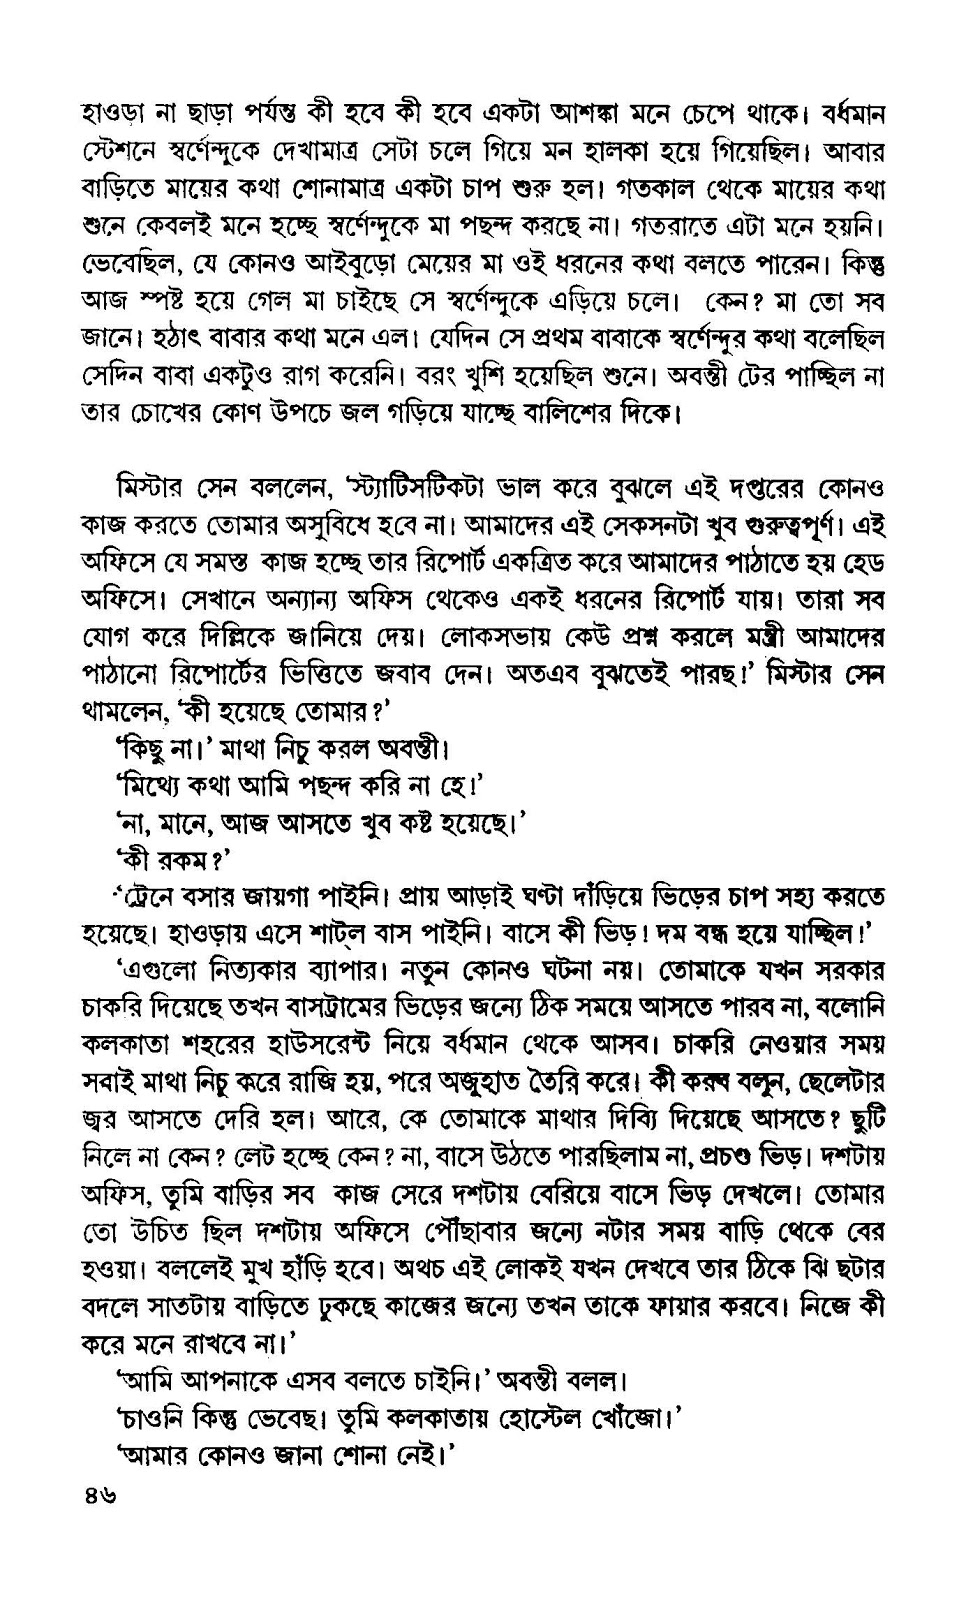 Josnay Borshar Megh by Samaresh Majumdar